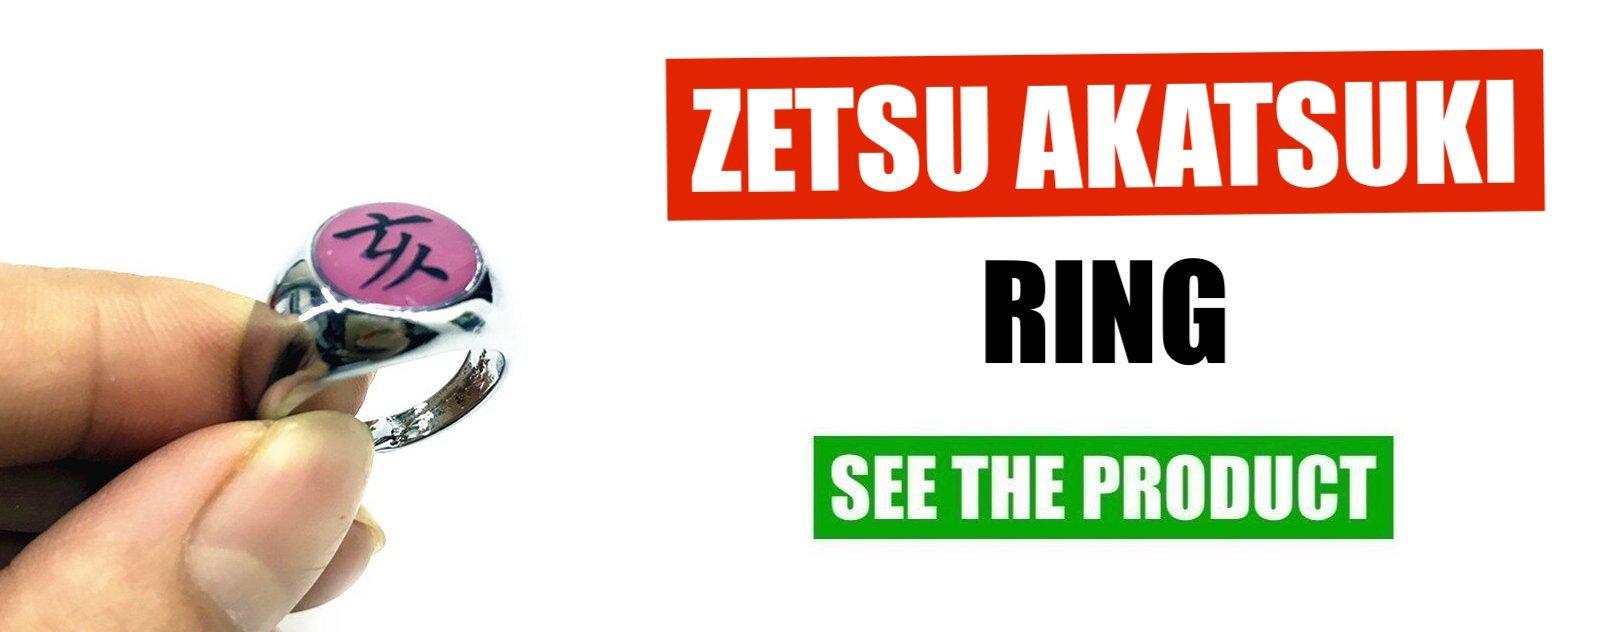 zetsu ring